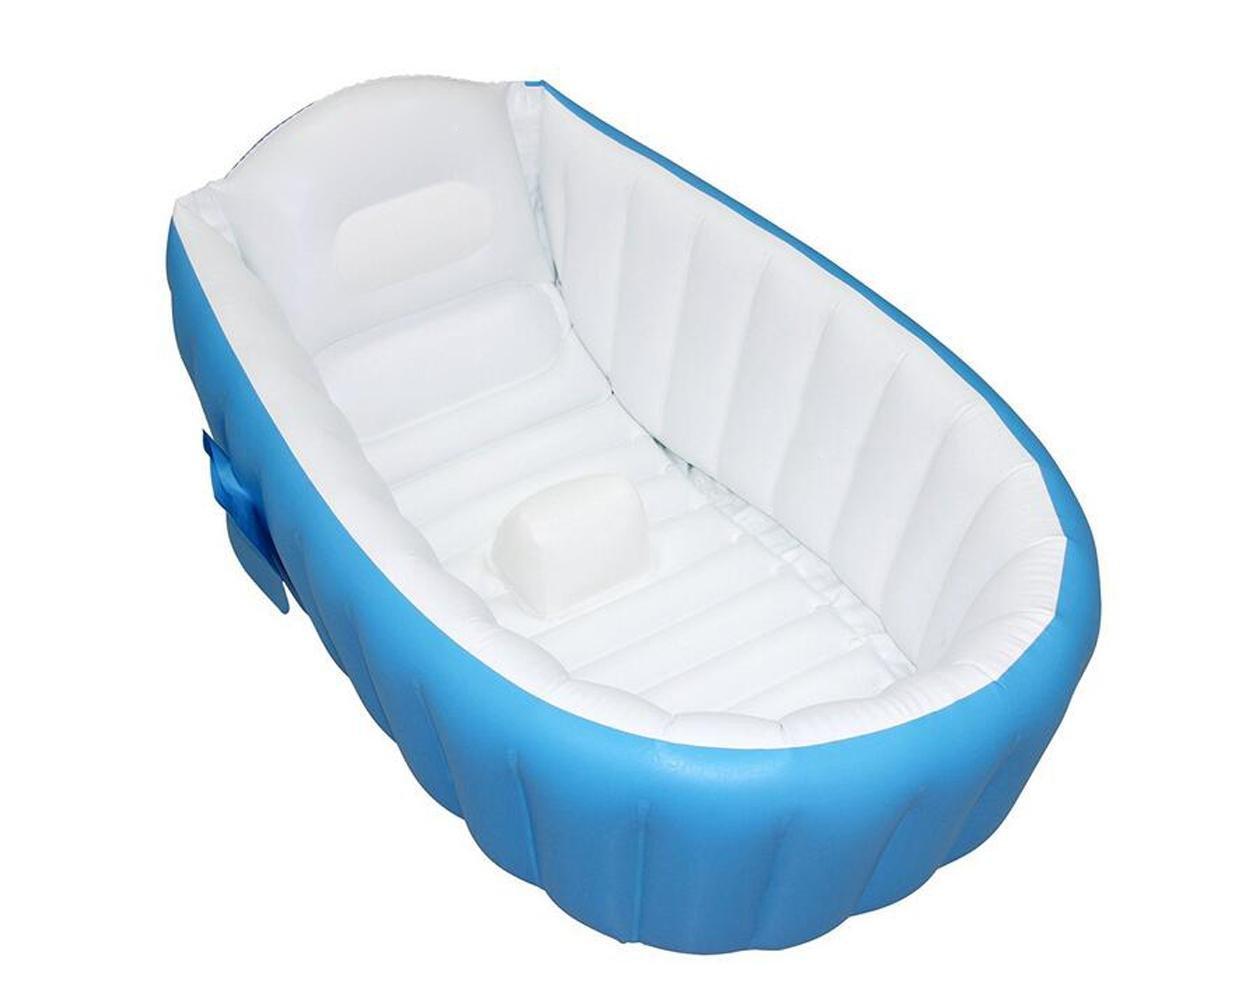 OOFWY Baby aufblasbarer Scherle Inflatable Bad-Bassin-Baby-Pool (98  64  28cm)